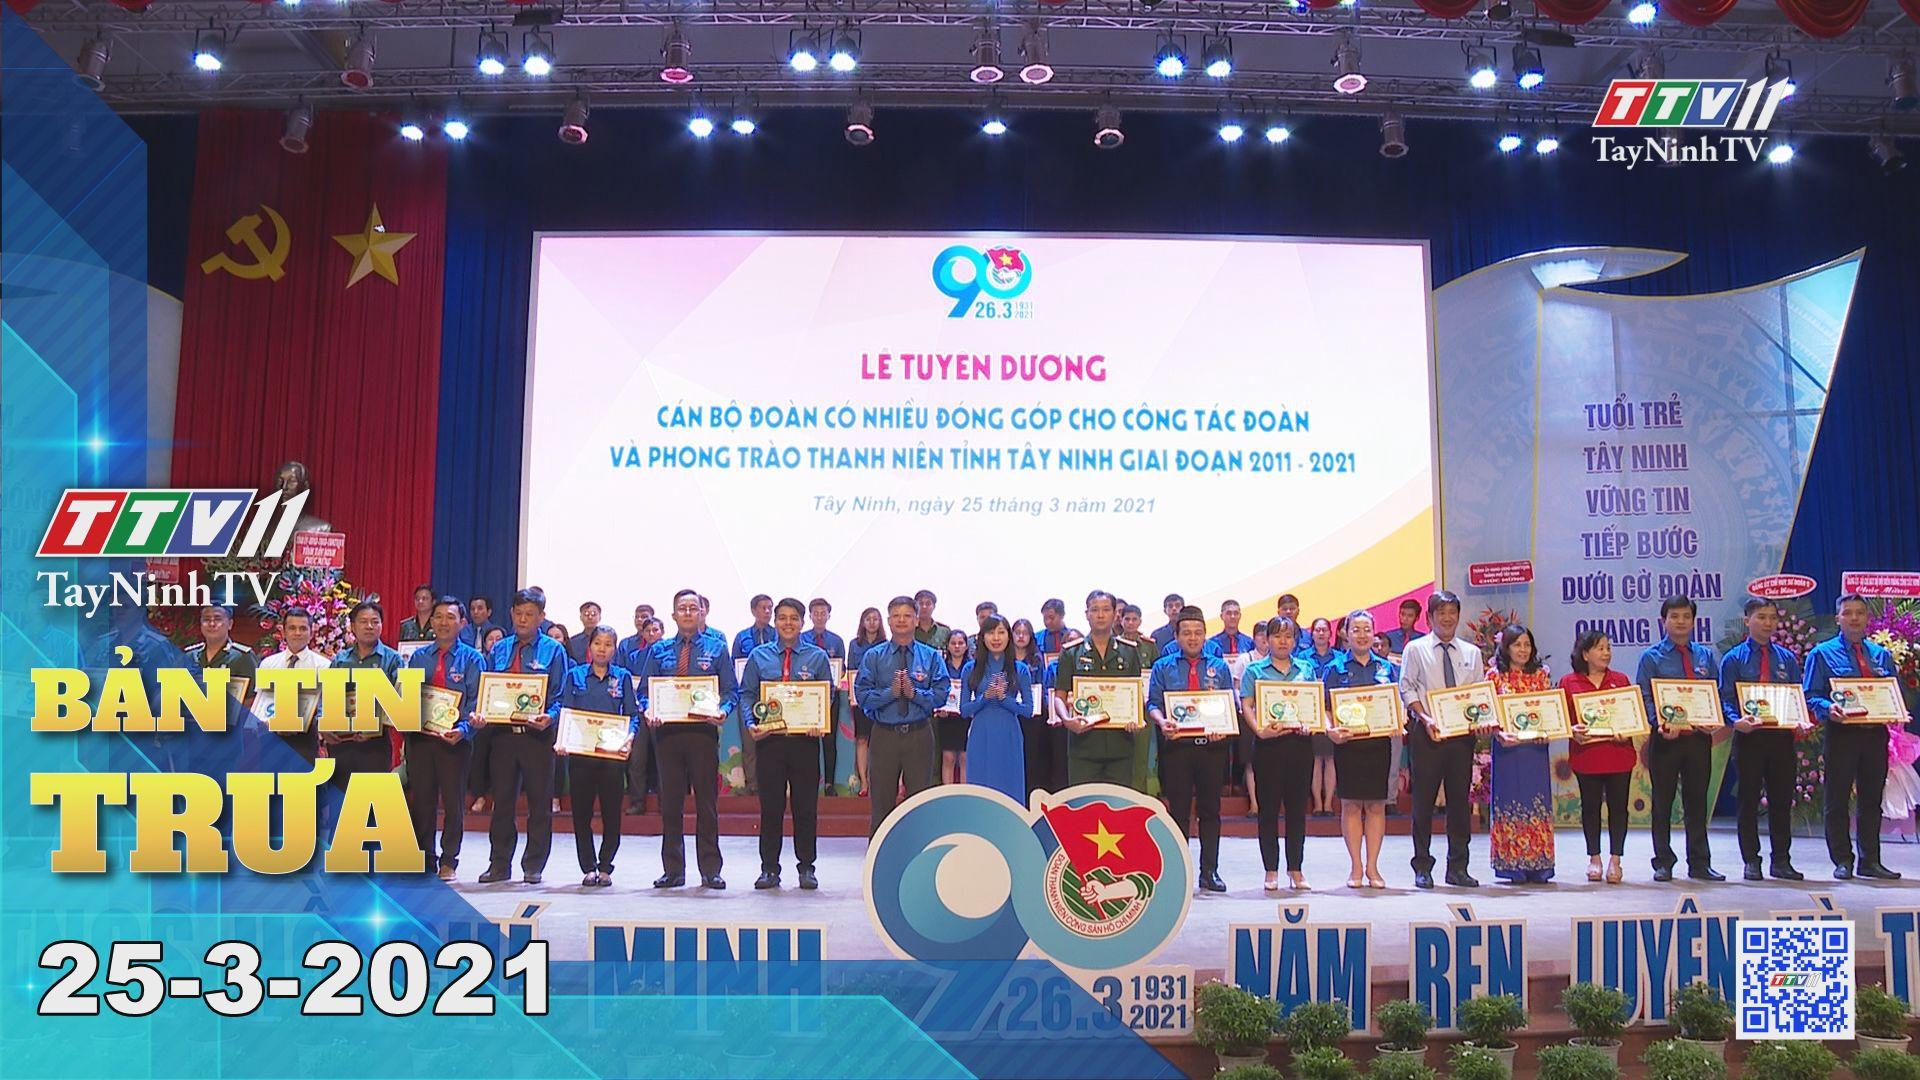 Bản tin trưa 25-3-2021 | Tin tức hôm nay | TayNinhTV